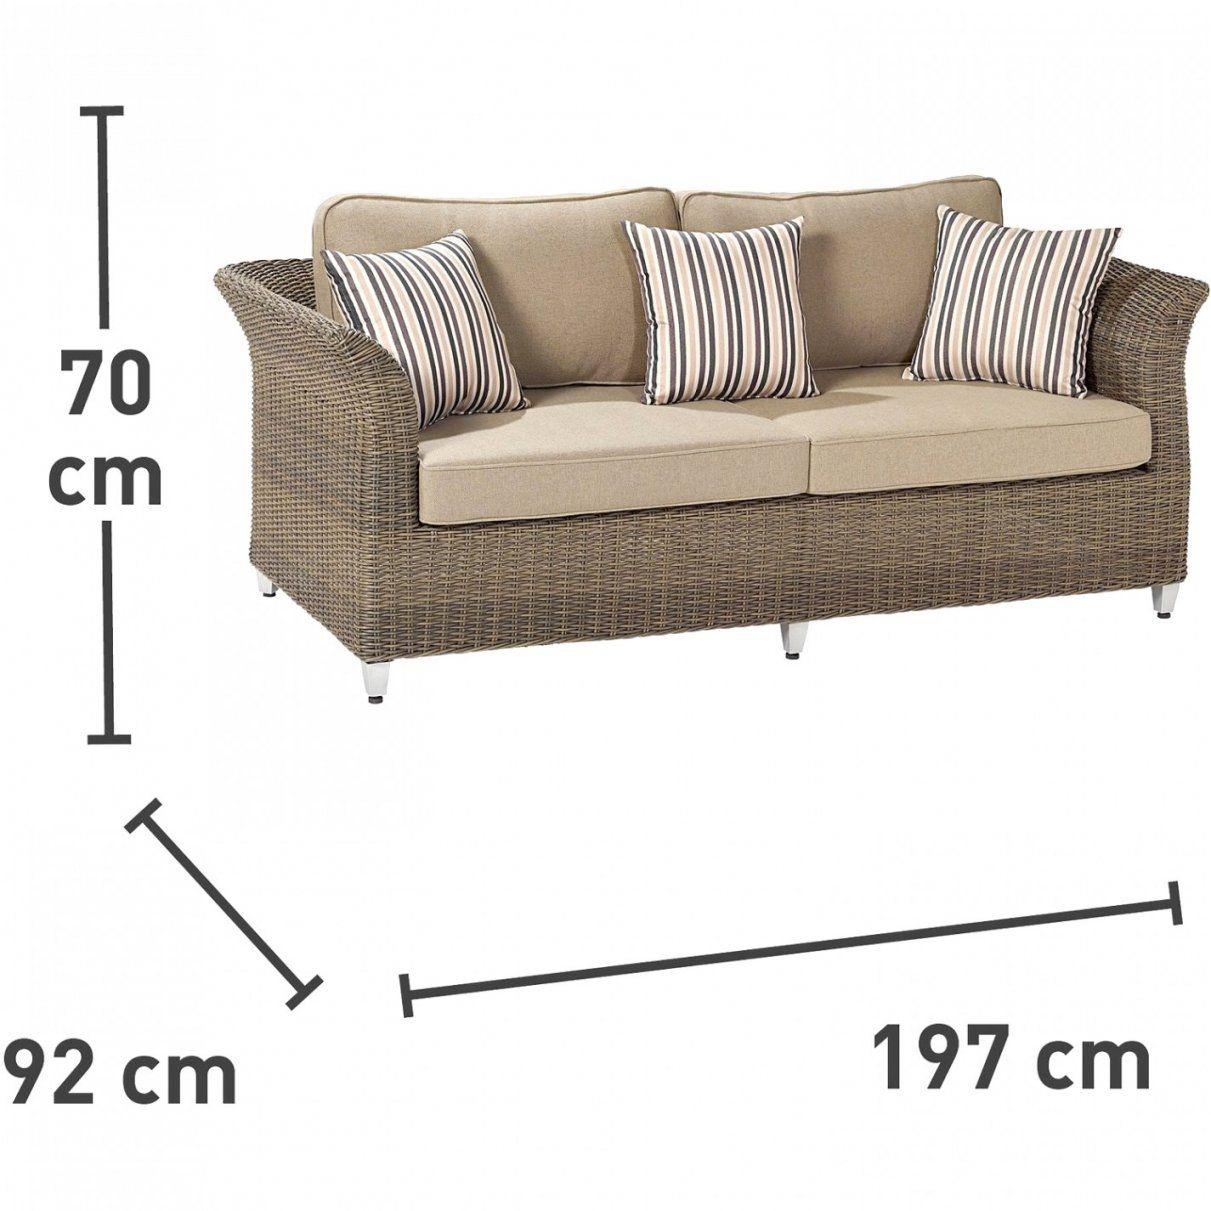 sofa neu beziehen kosten cheap red sofa beautiful futon schn futon san francisco sofa sofa. Black Bedroom Furniture Sets. Home Design Ideas